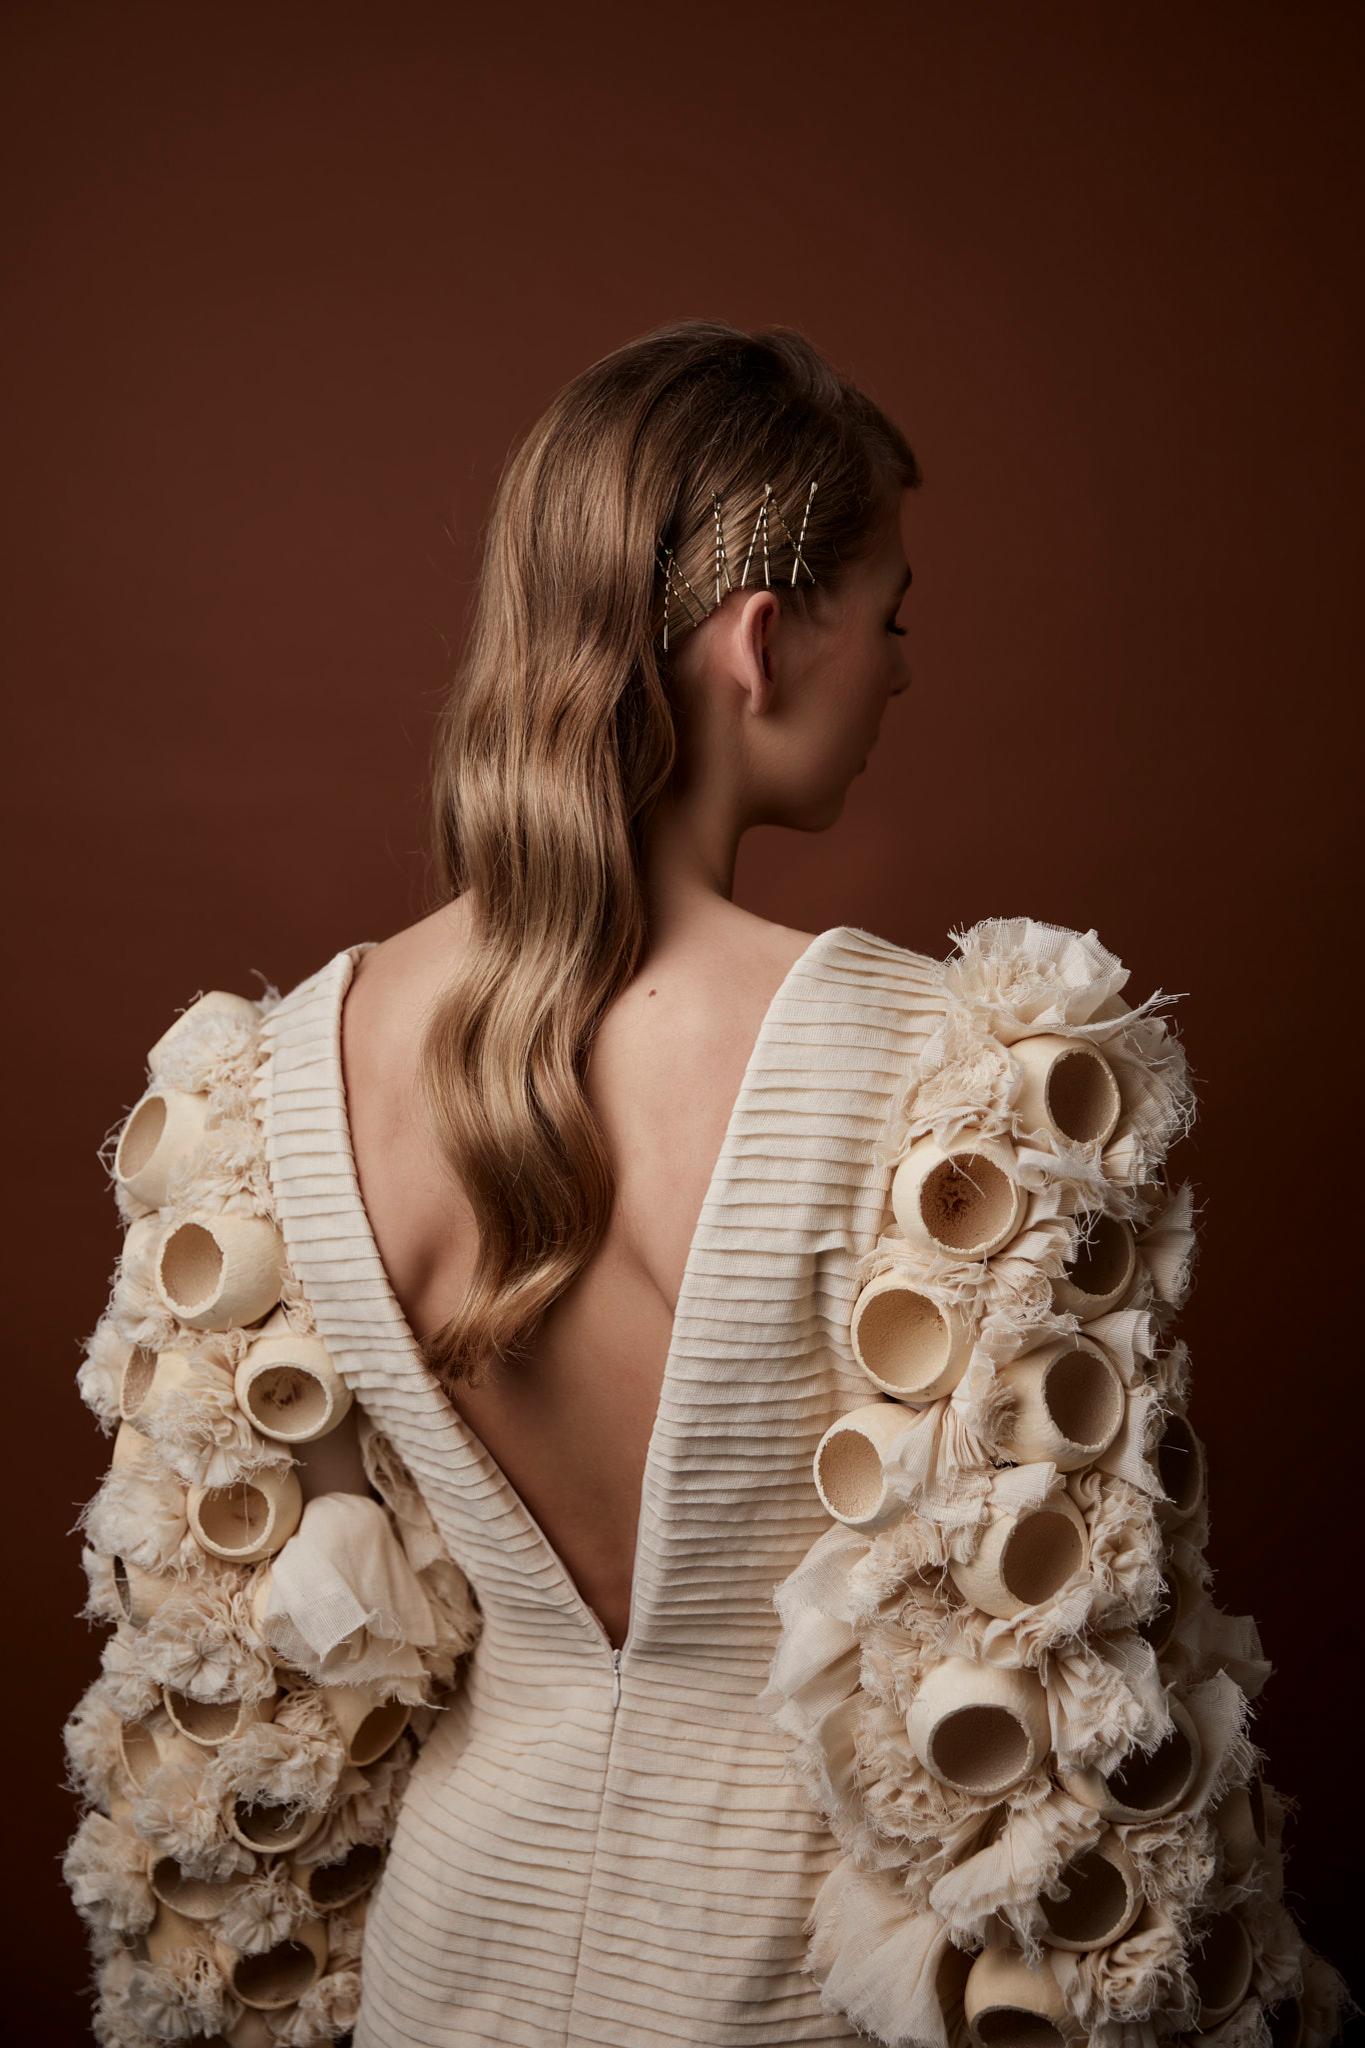 oda-theplacetobibi6-bibiengelbertink-fashion-fotografie